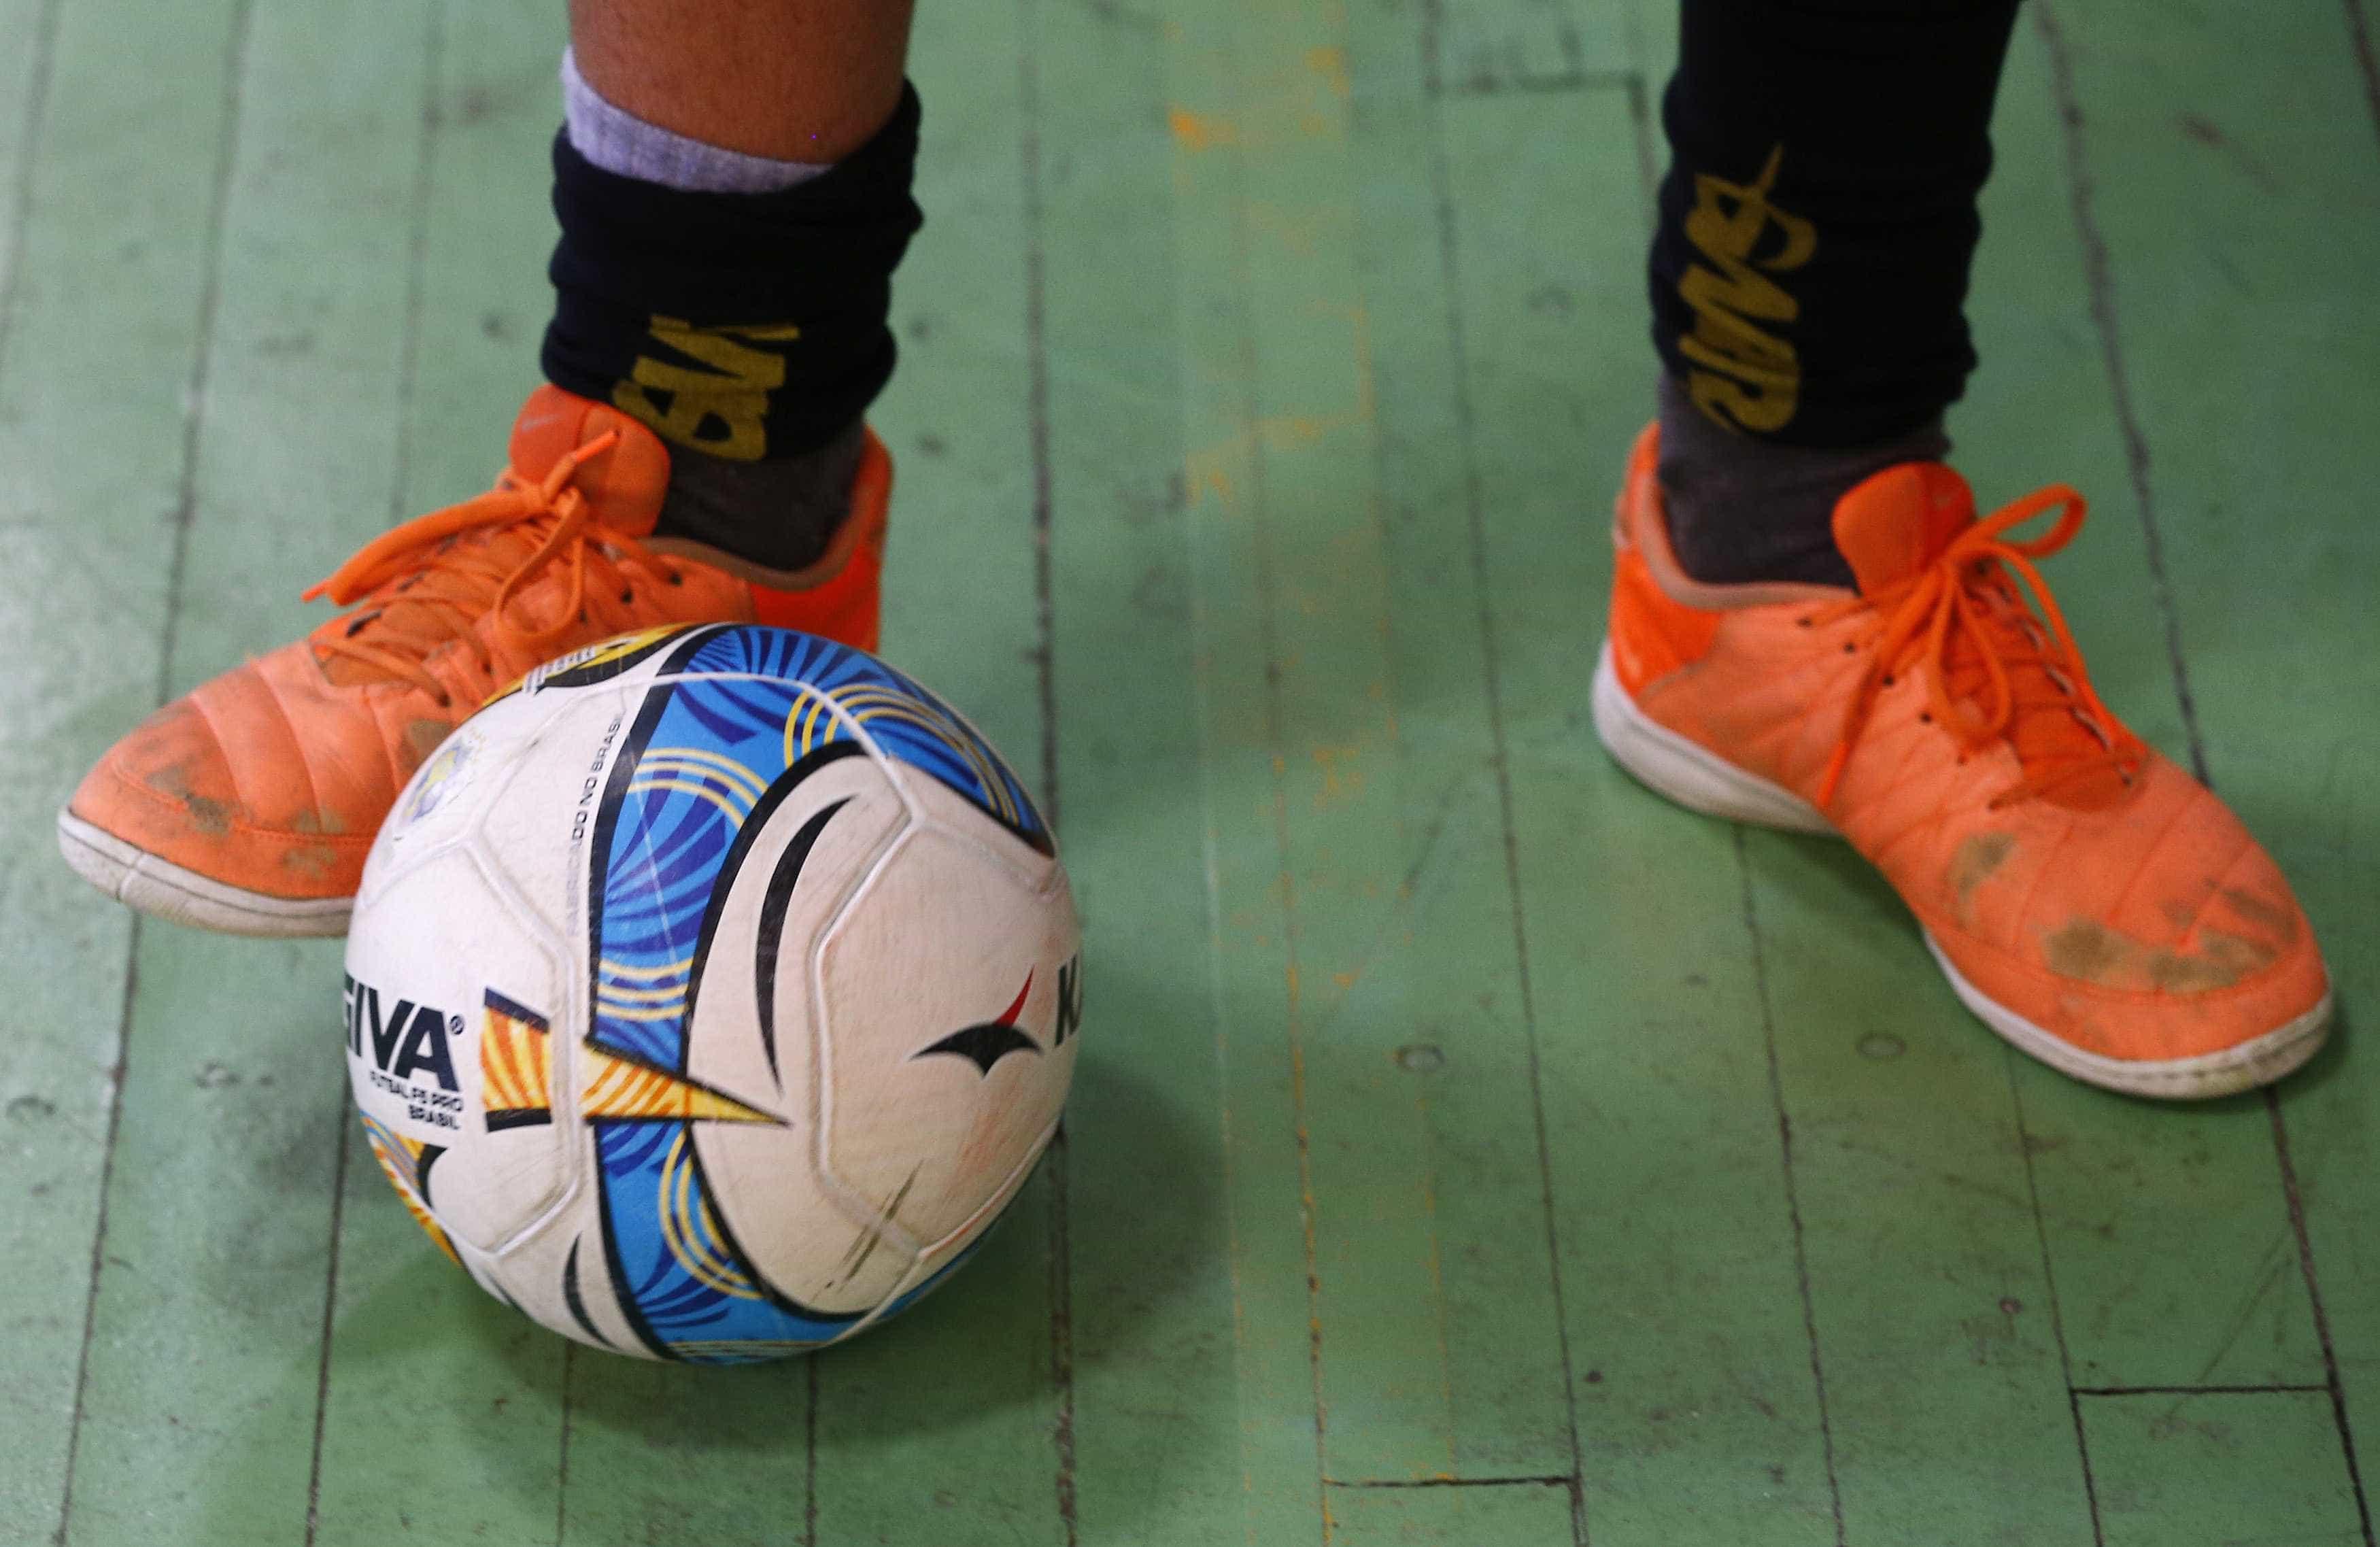 Tribunal condena jogador de futsal por agressão a árbitro